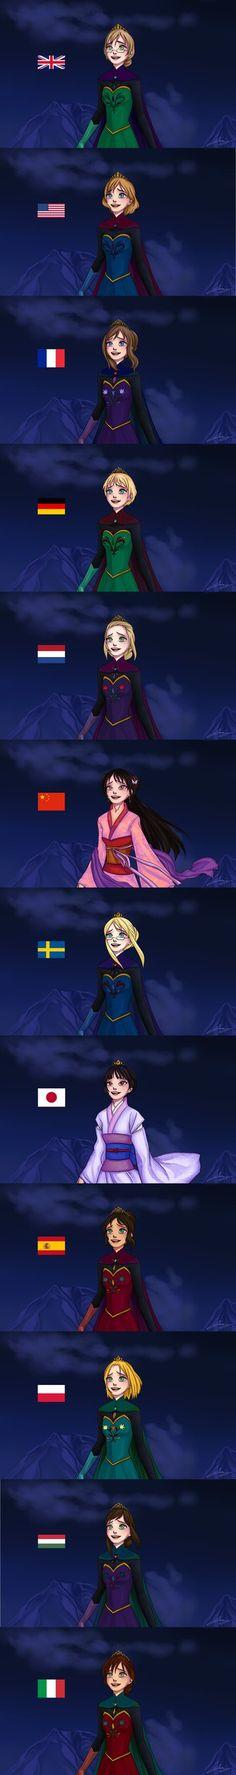 Frozen-Hetalia - Let it go - complete1 by x-Lilou-chan-x on DeviantArt